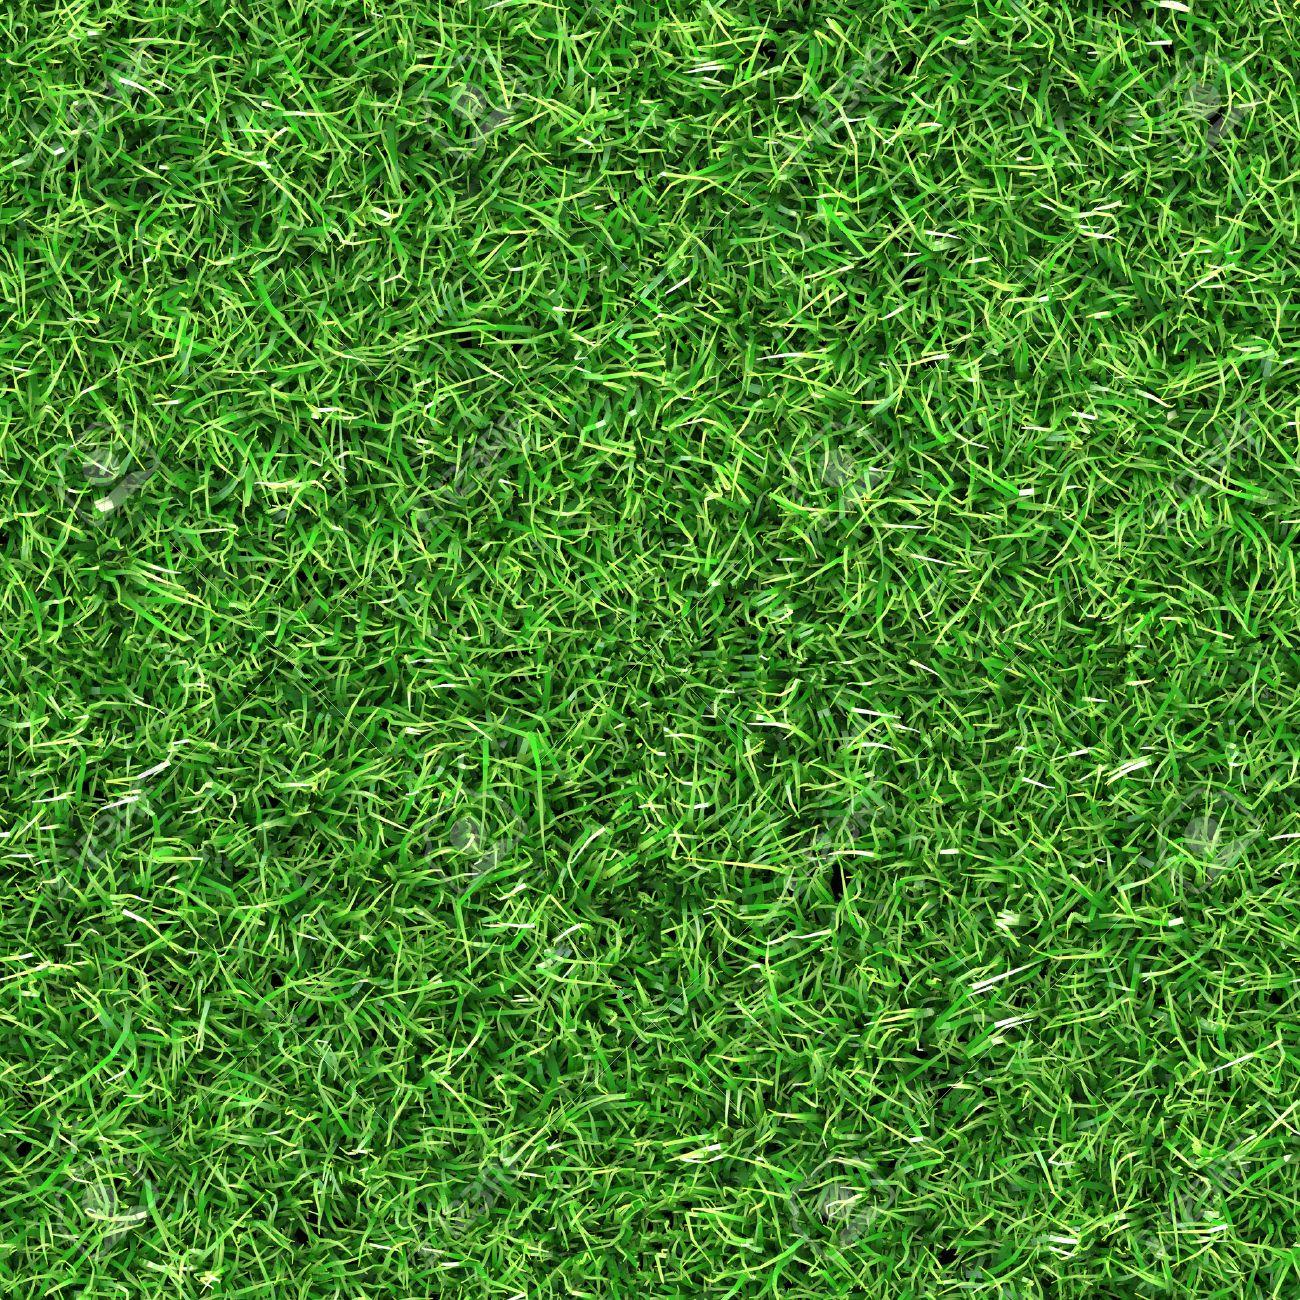 seamless grass texture Stock Photo - 31443220